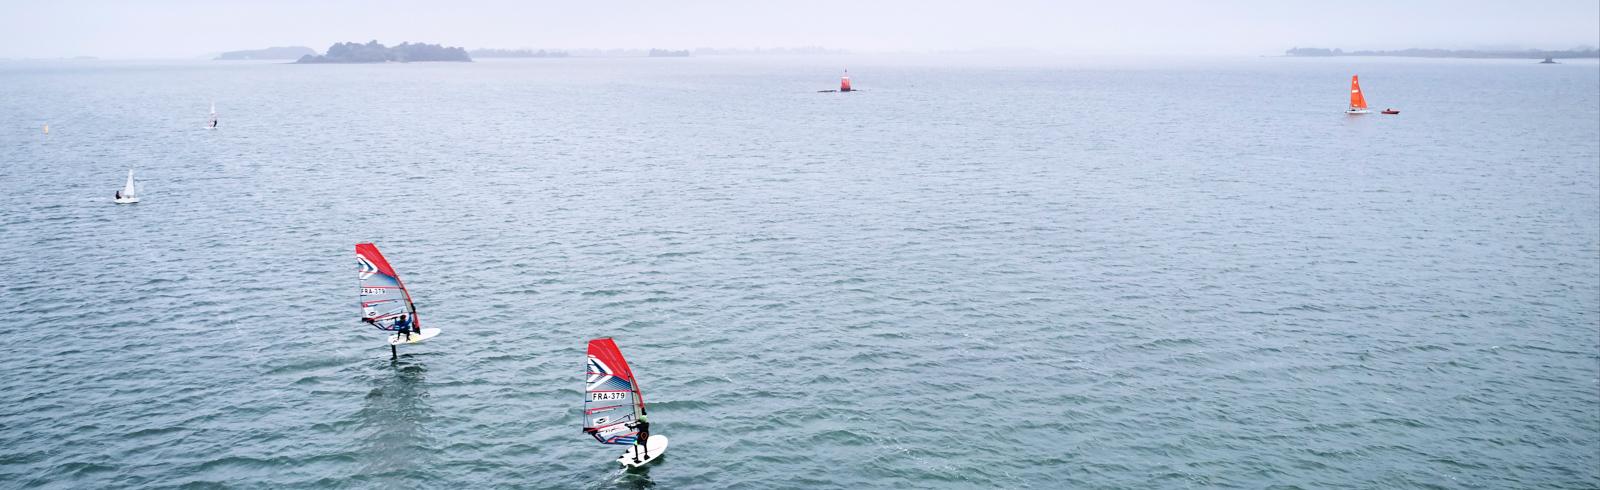 windsurf dans golfe du morbihan